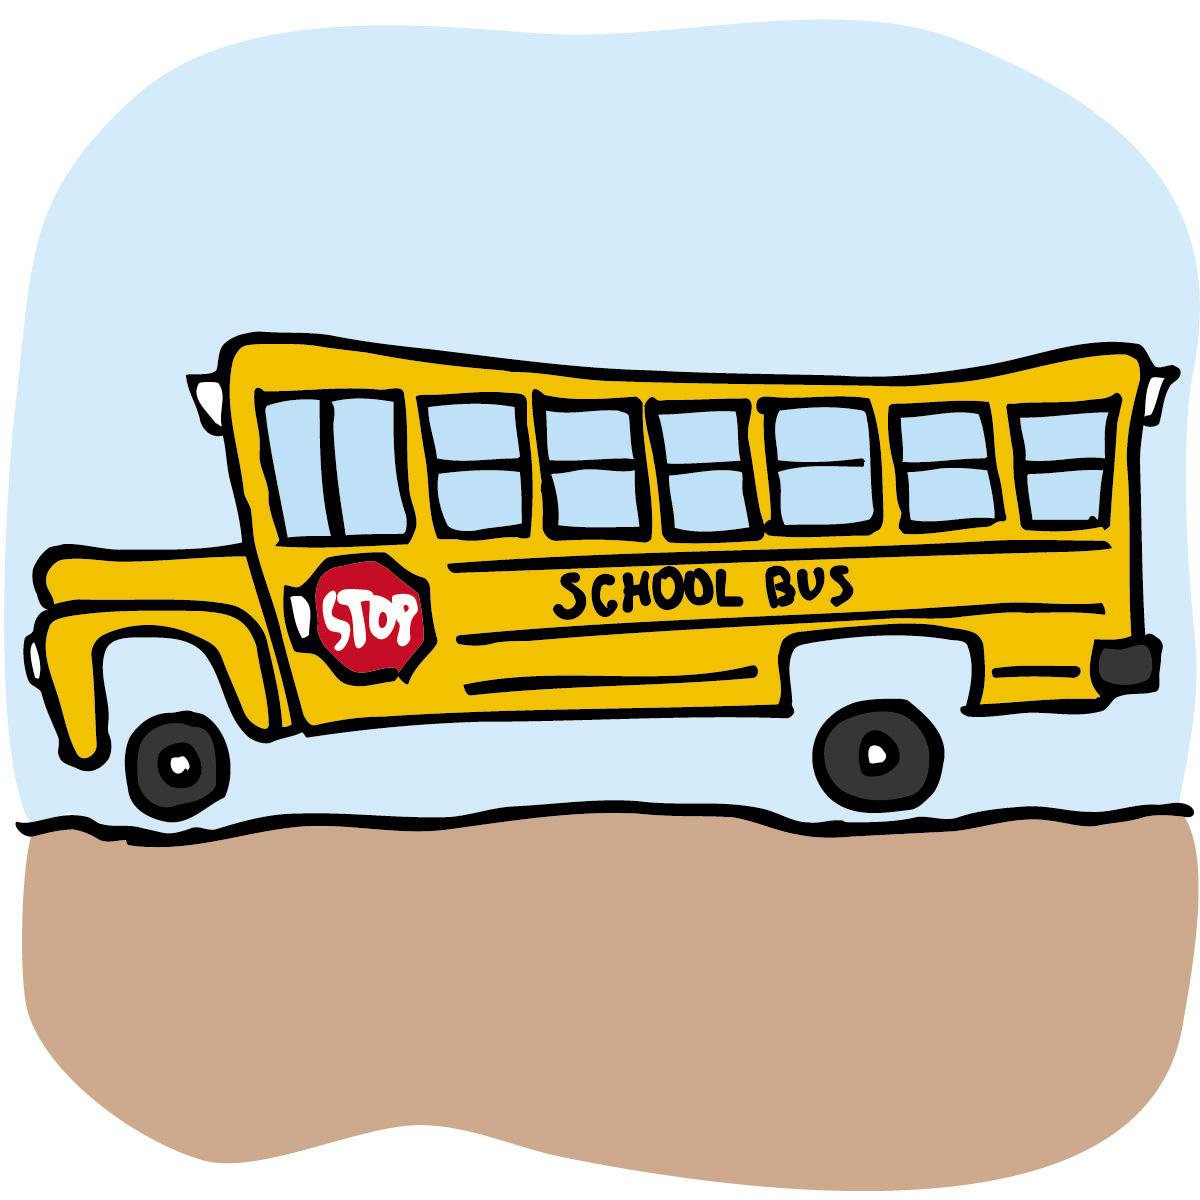 red bus clipart clipart panda free clipart images rh clipartpanda com International School Bus School Bus Crash Kills 4